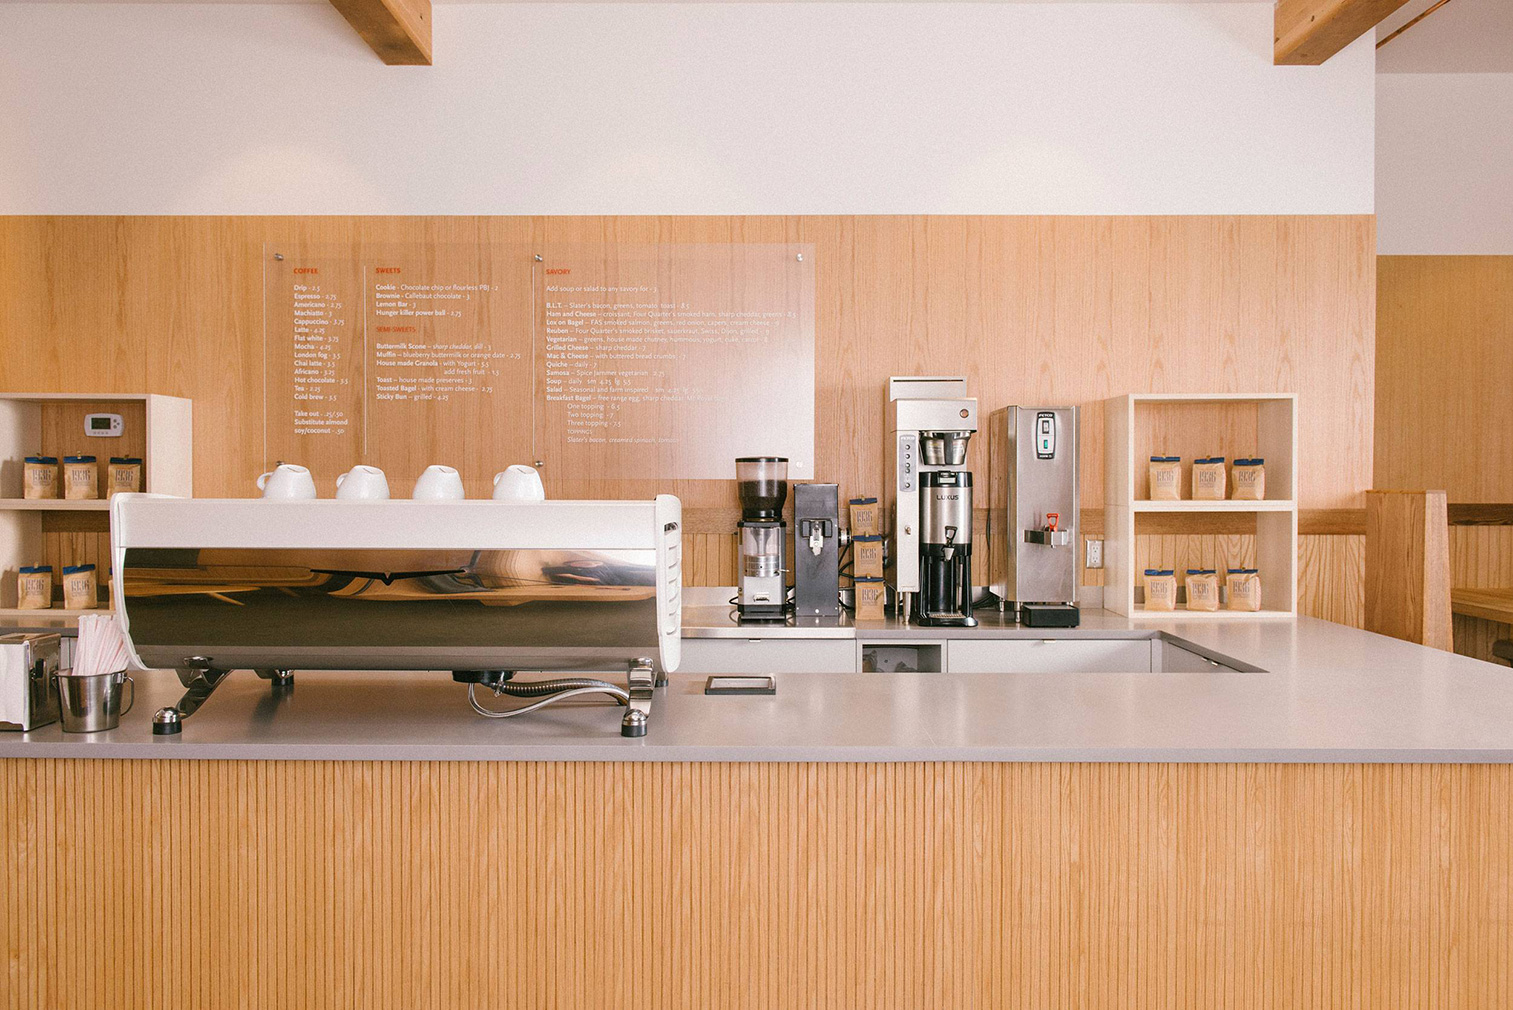 Parsonage Cafe in Victoria, BC